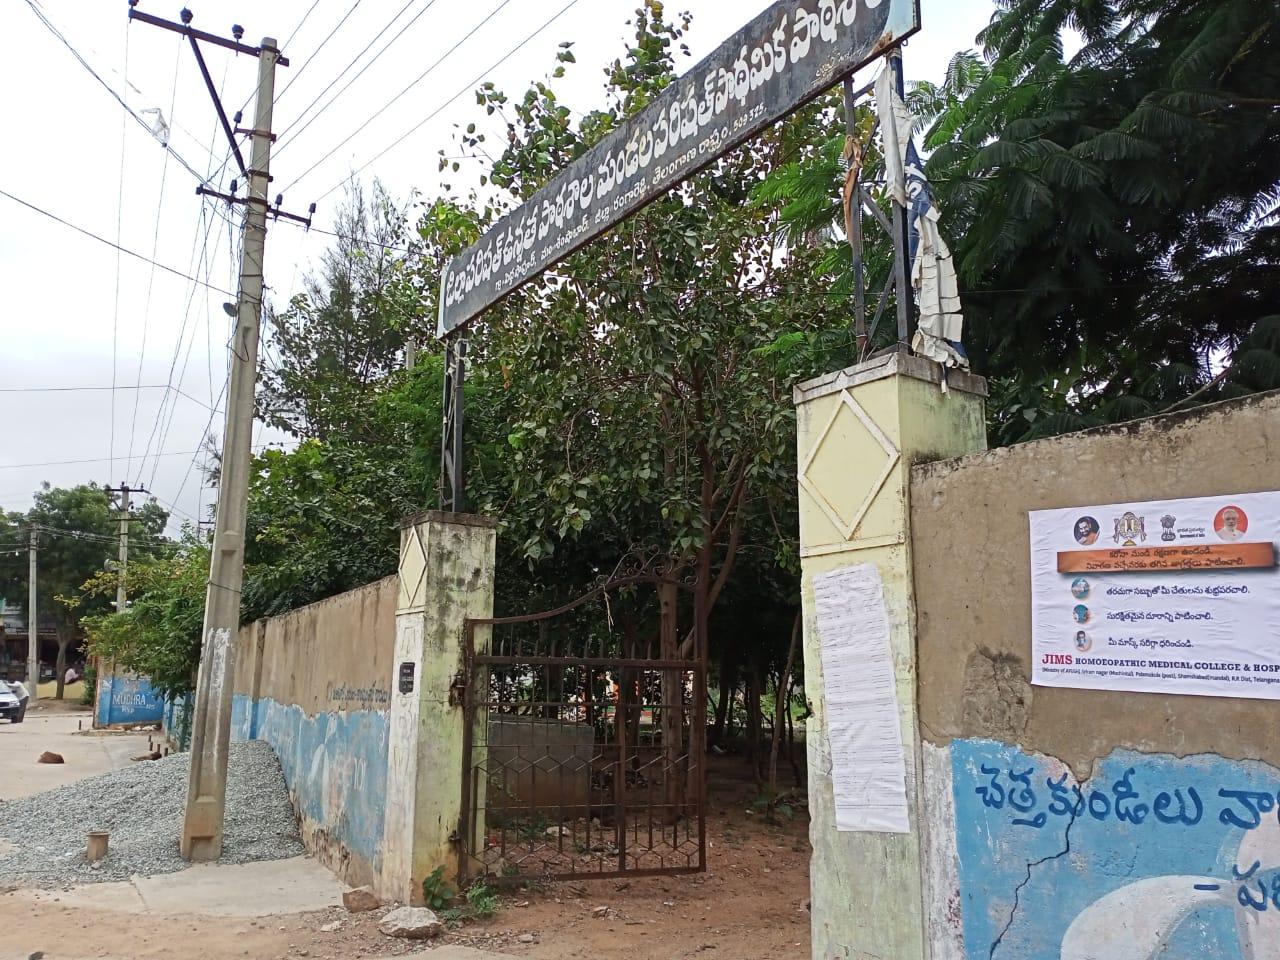 Janandolan Campaign On COVID 19 – IEC poster sticking at Peddashapur of Shamshabad mandal